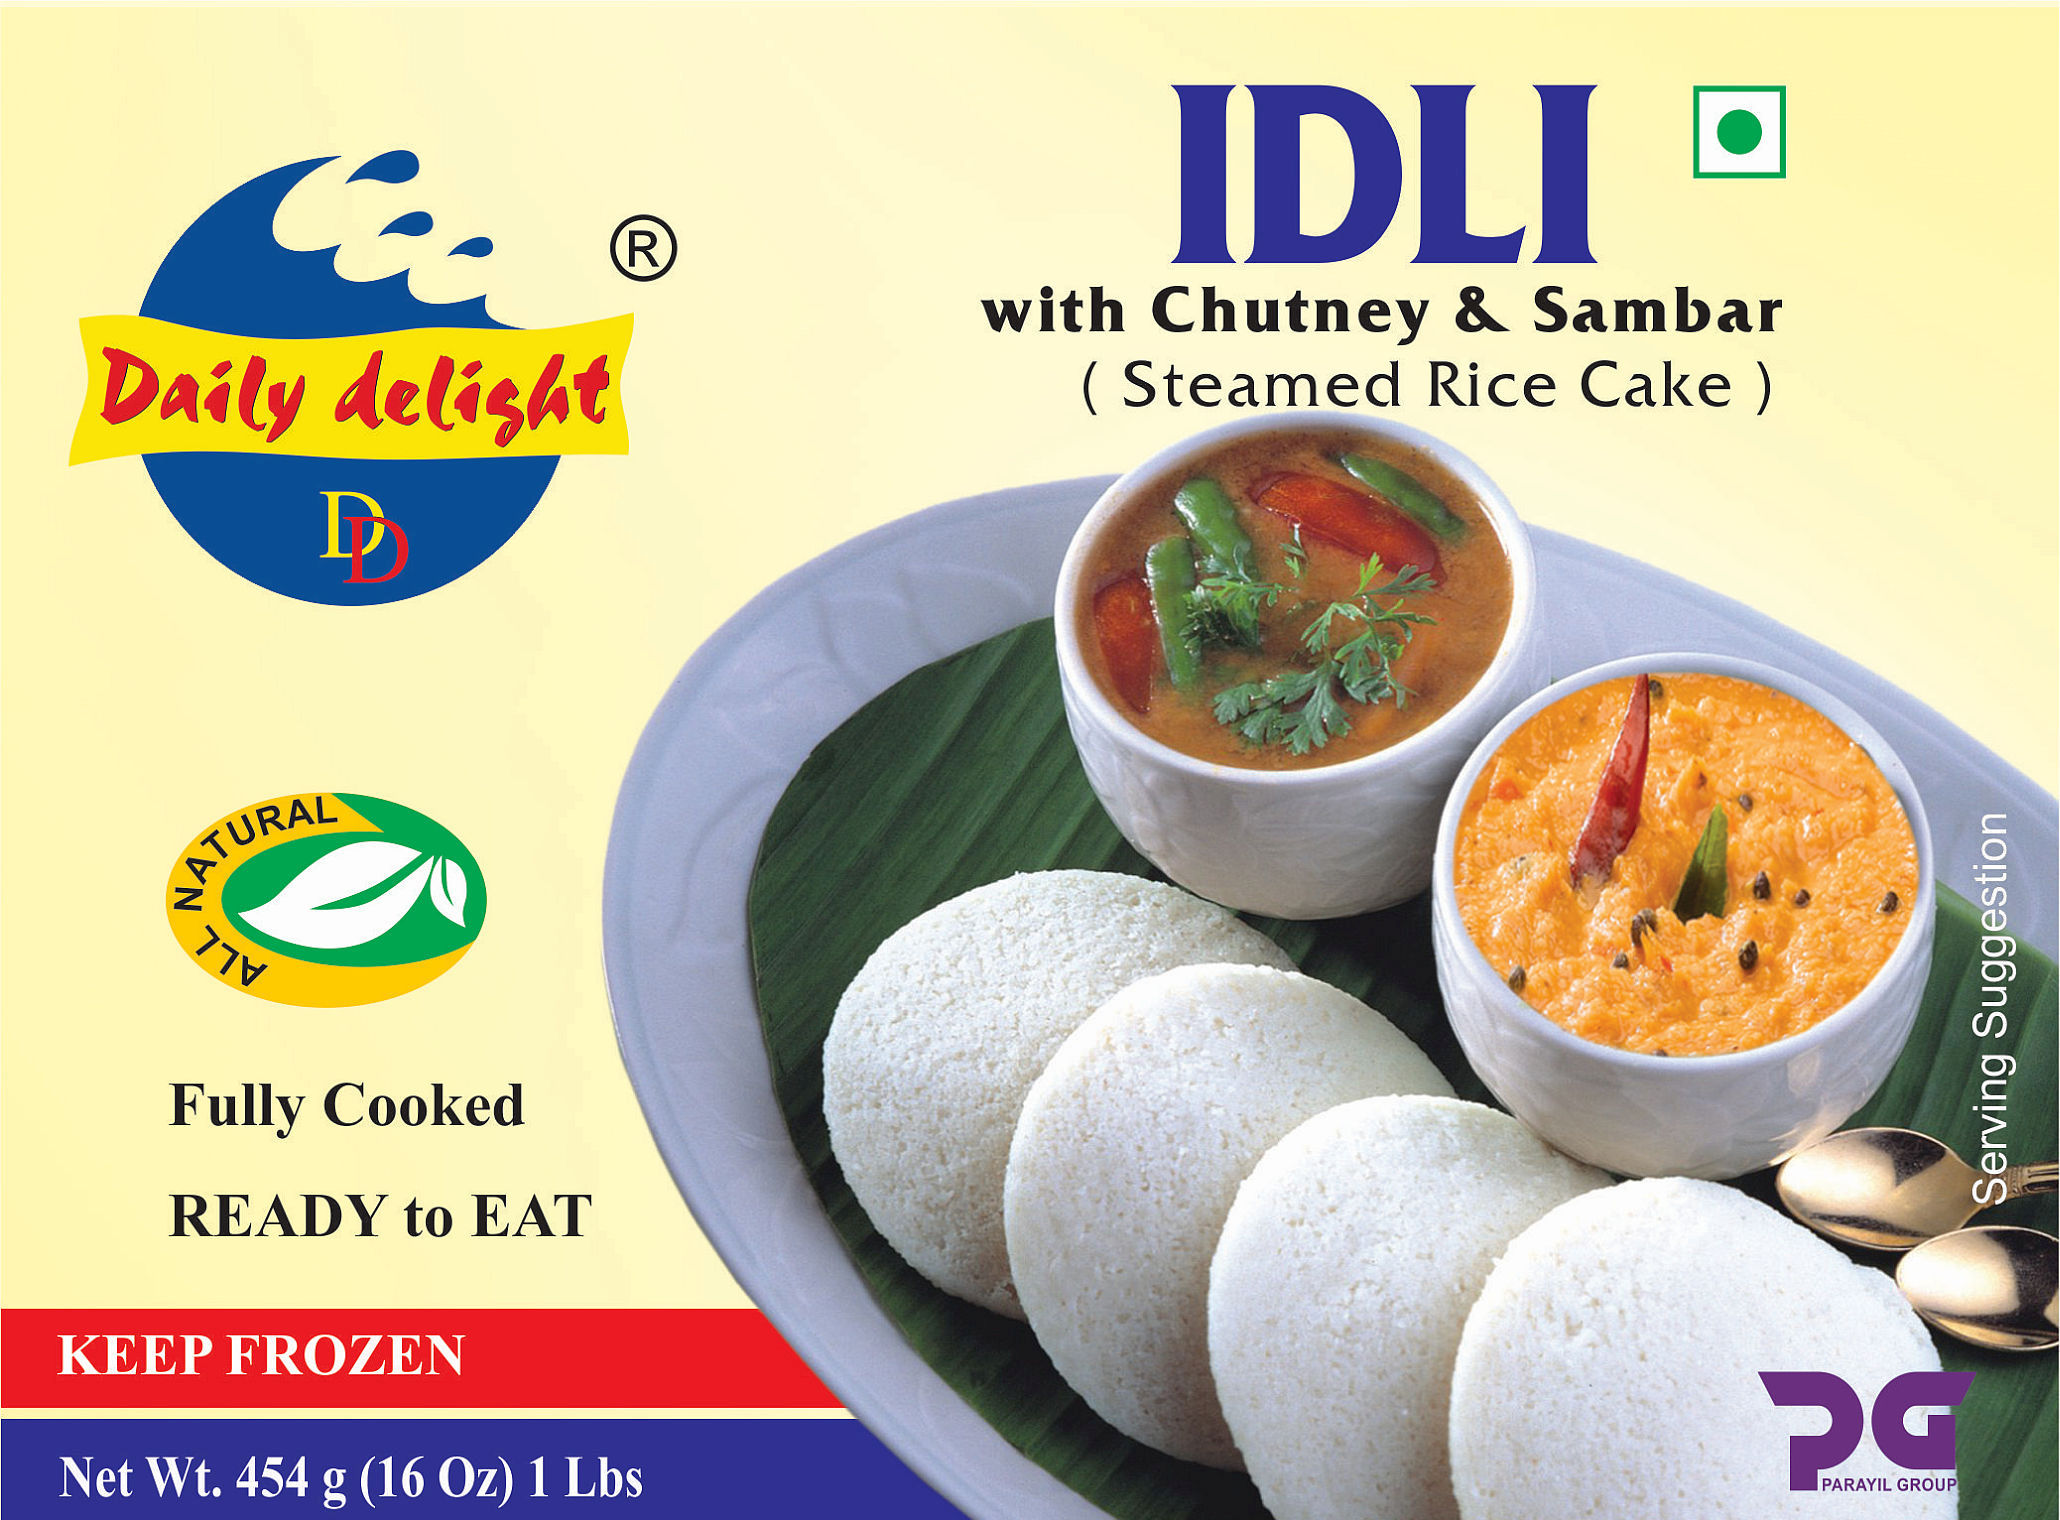 Daily Delight Idli